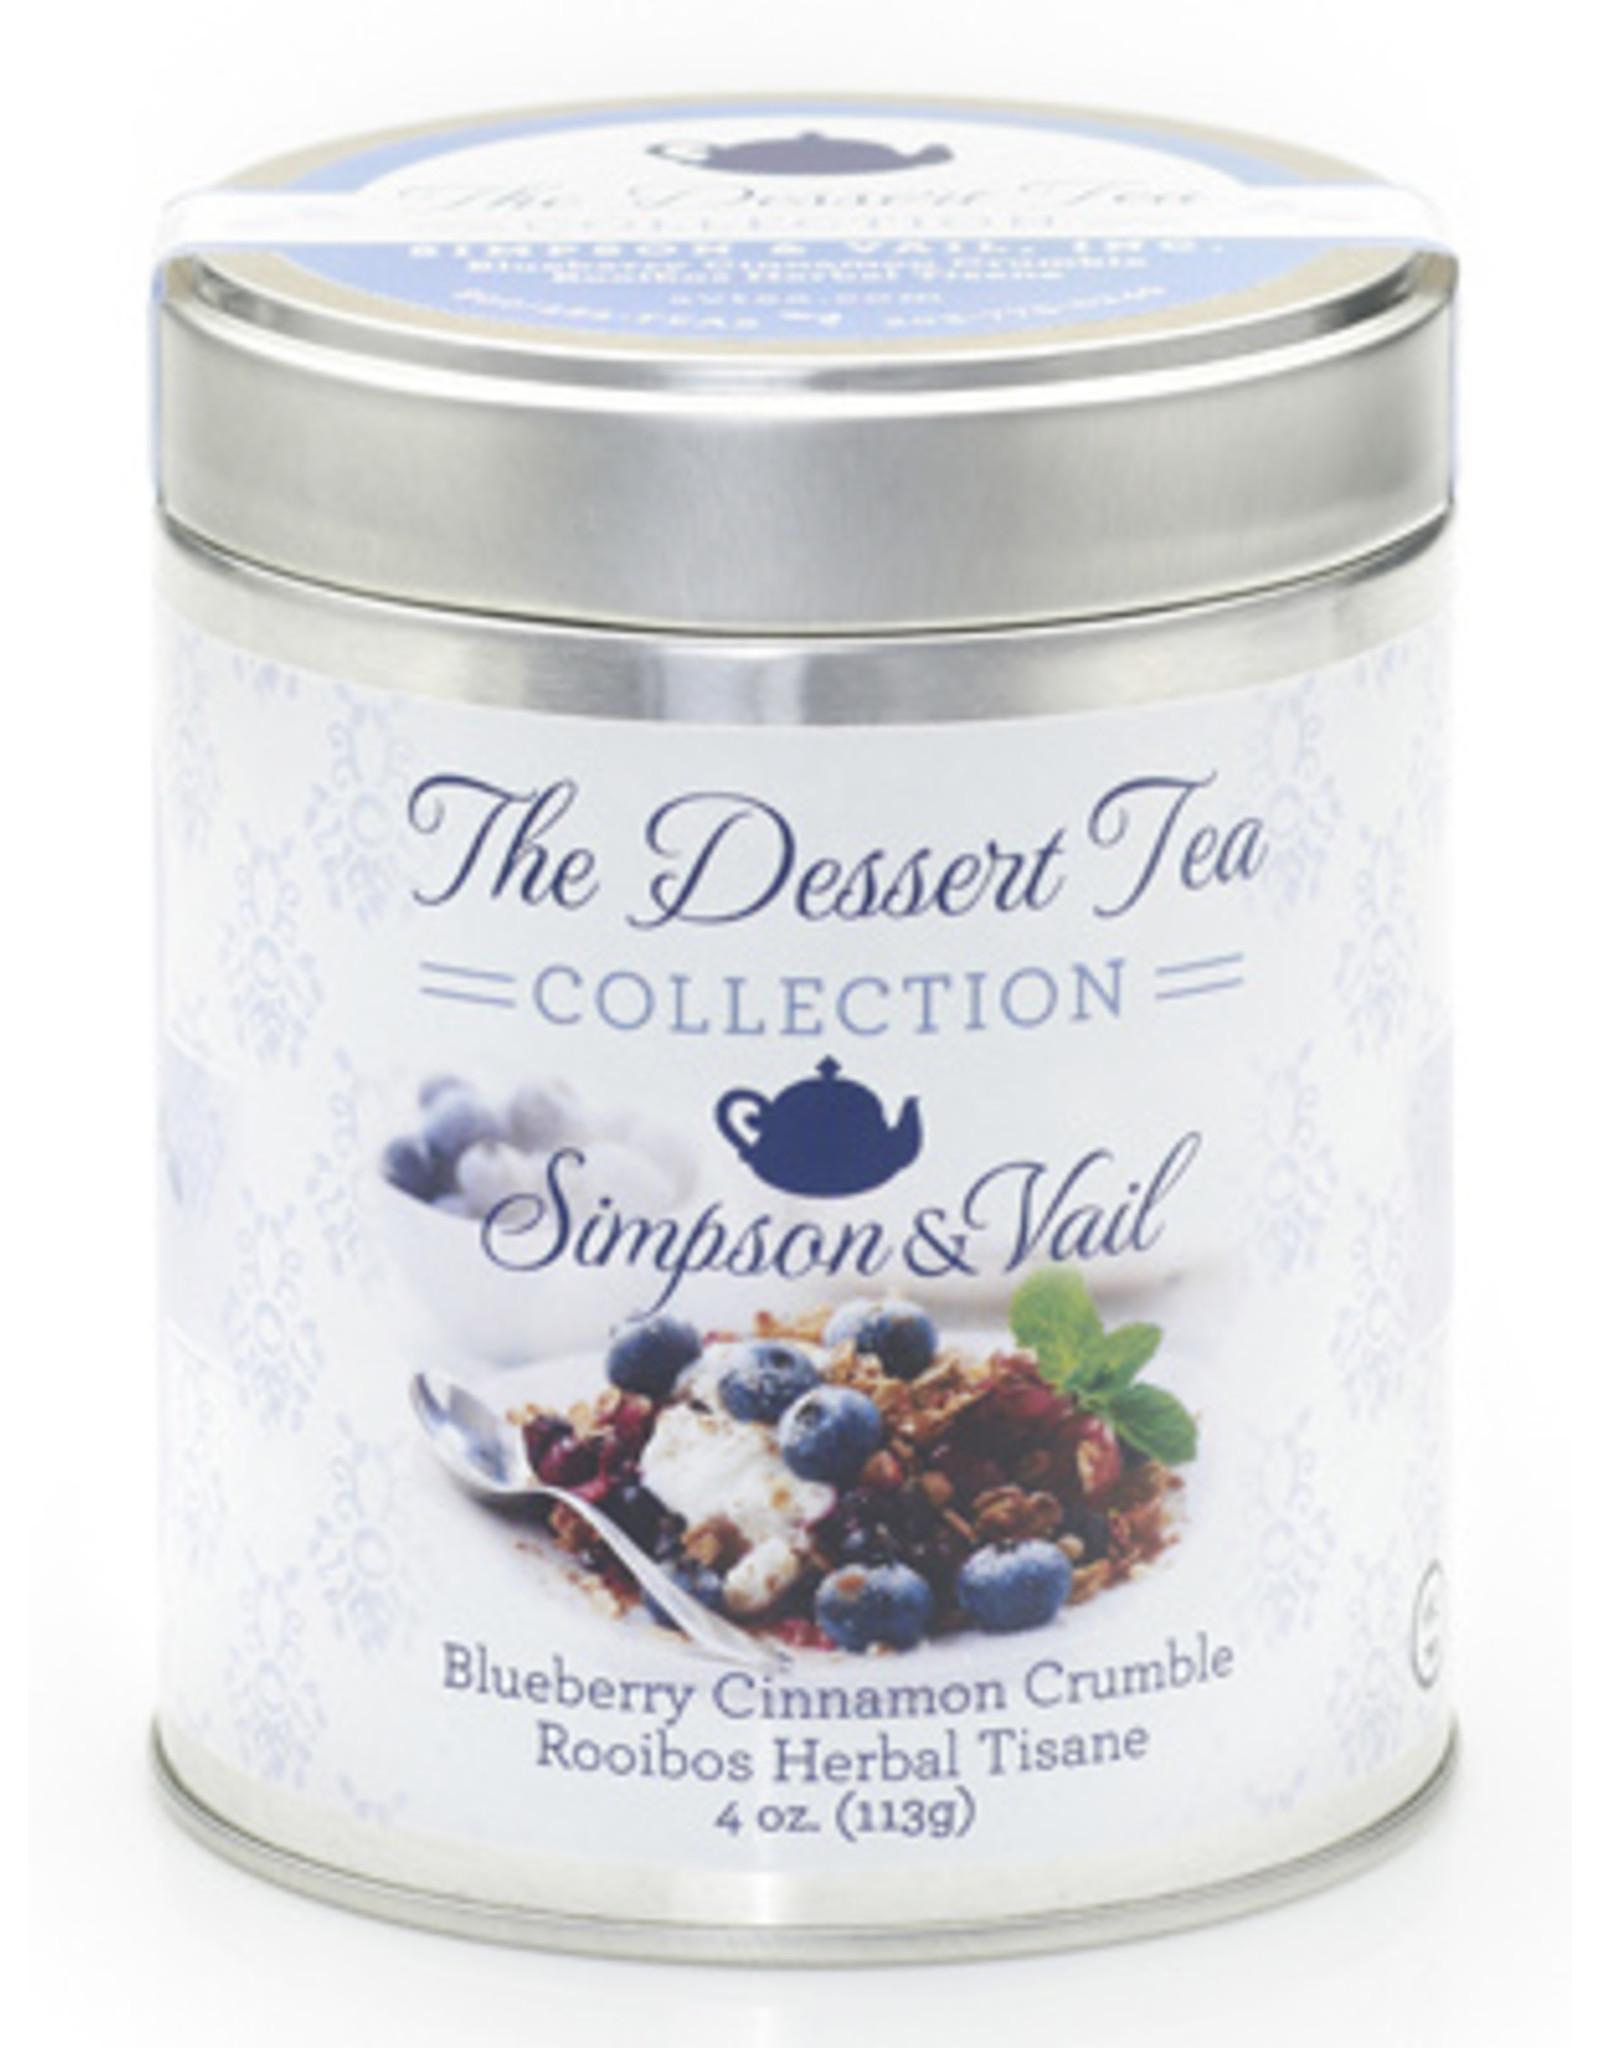 Simpson & Vail Blueberry Cinnamon Crumble Rooibos